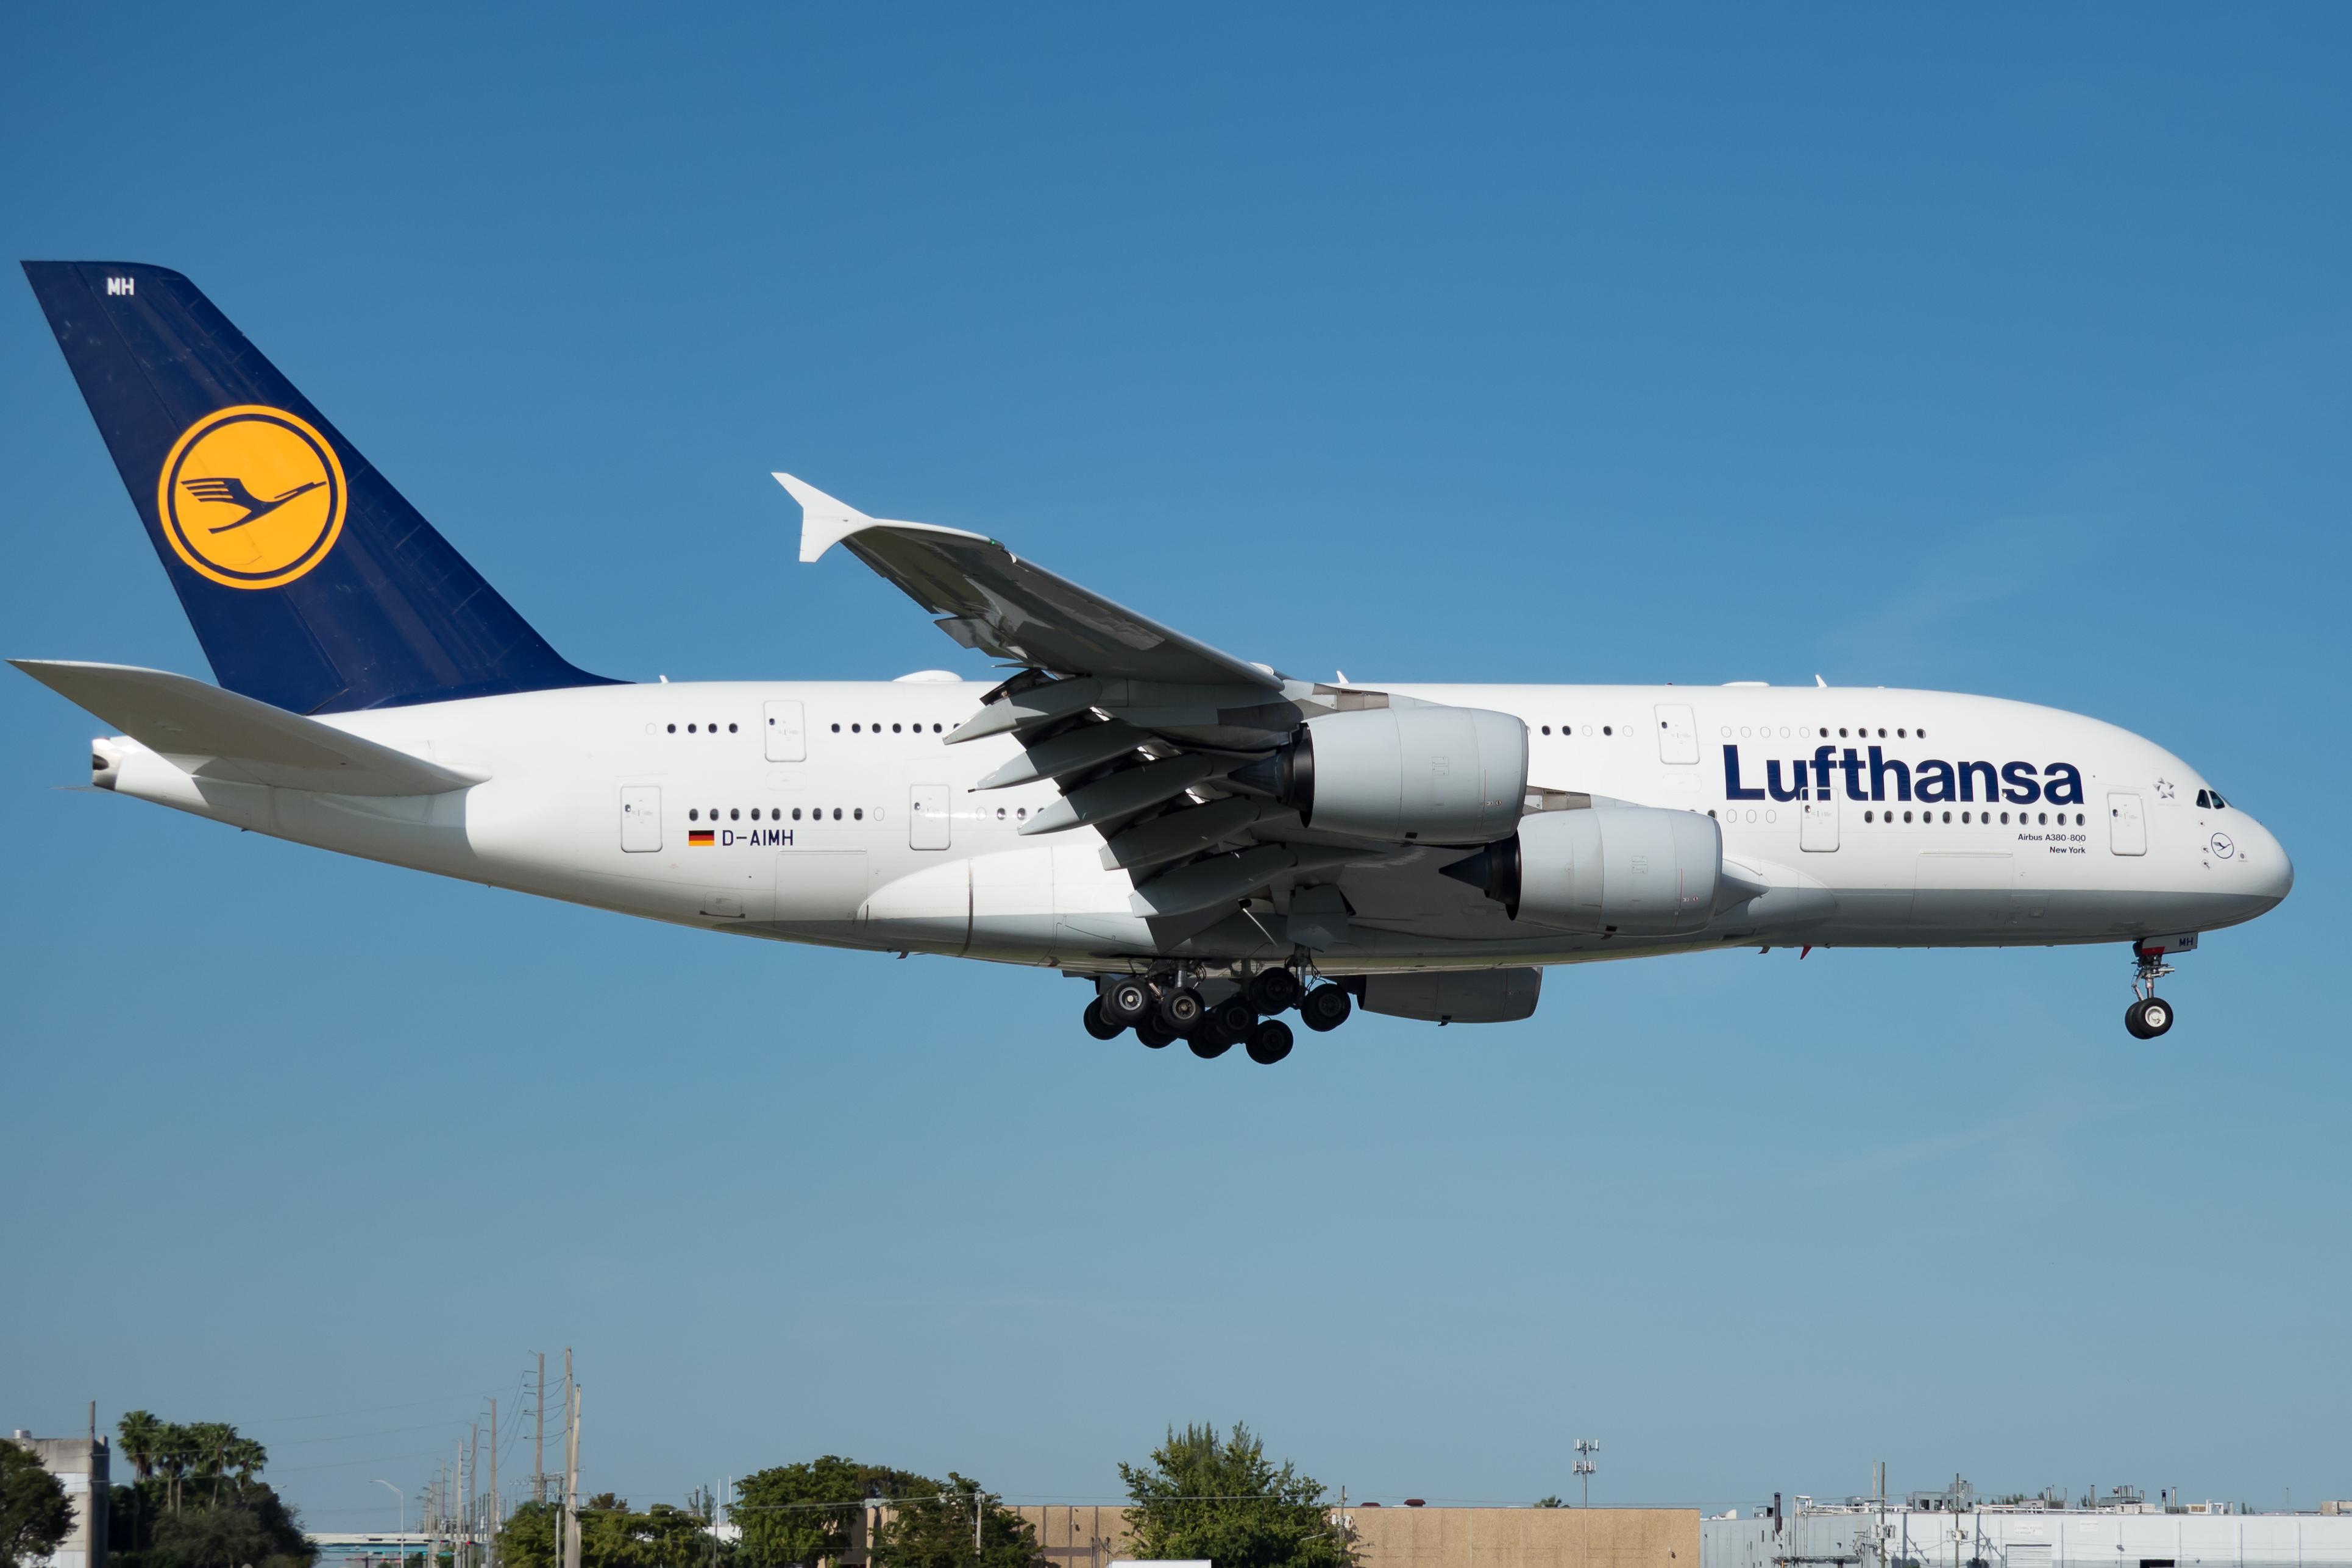 Https Www Latam Com En Us Flights Destinations Travel From Utm Content Parrlink